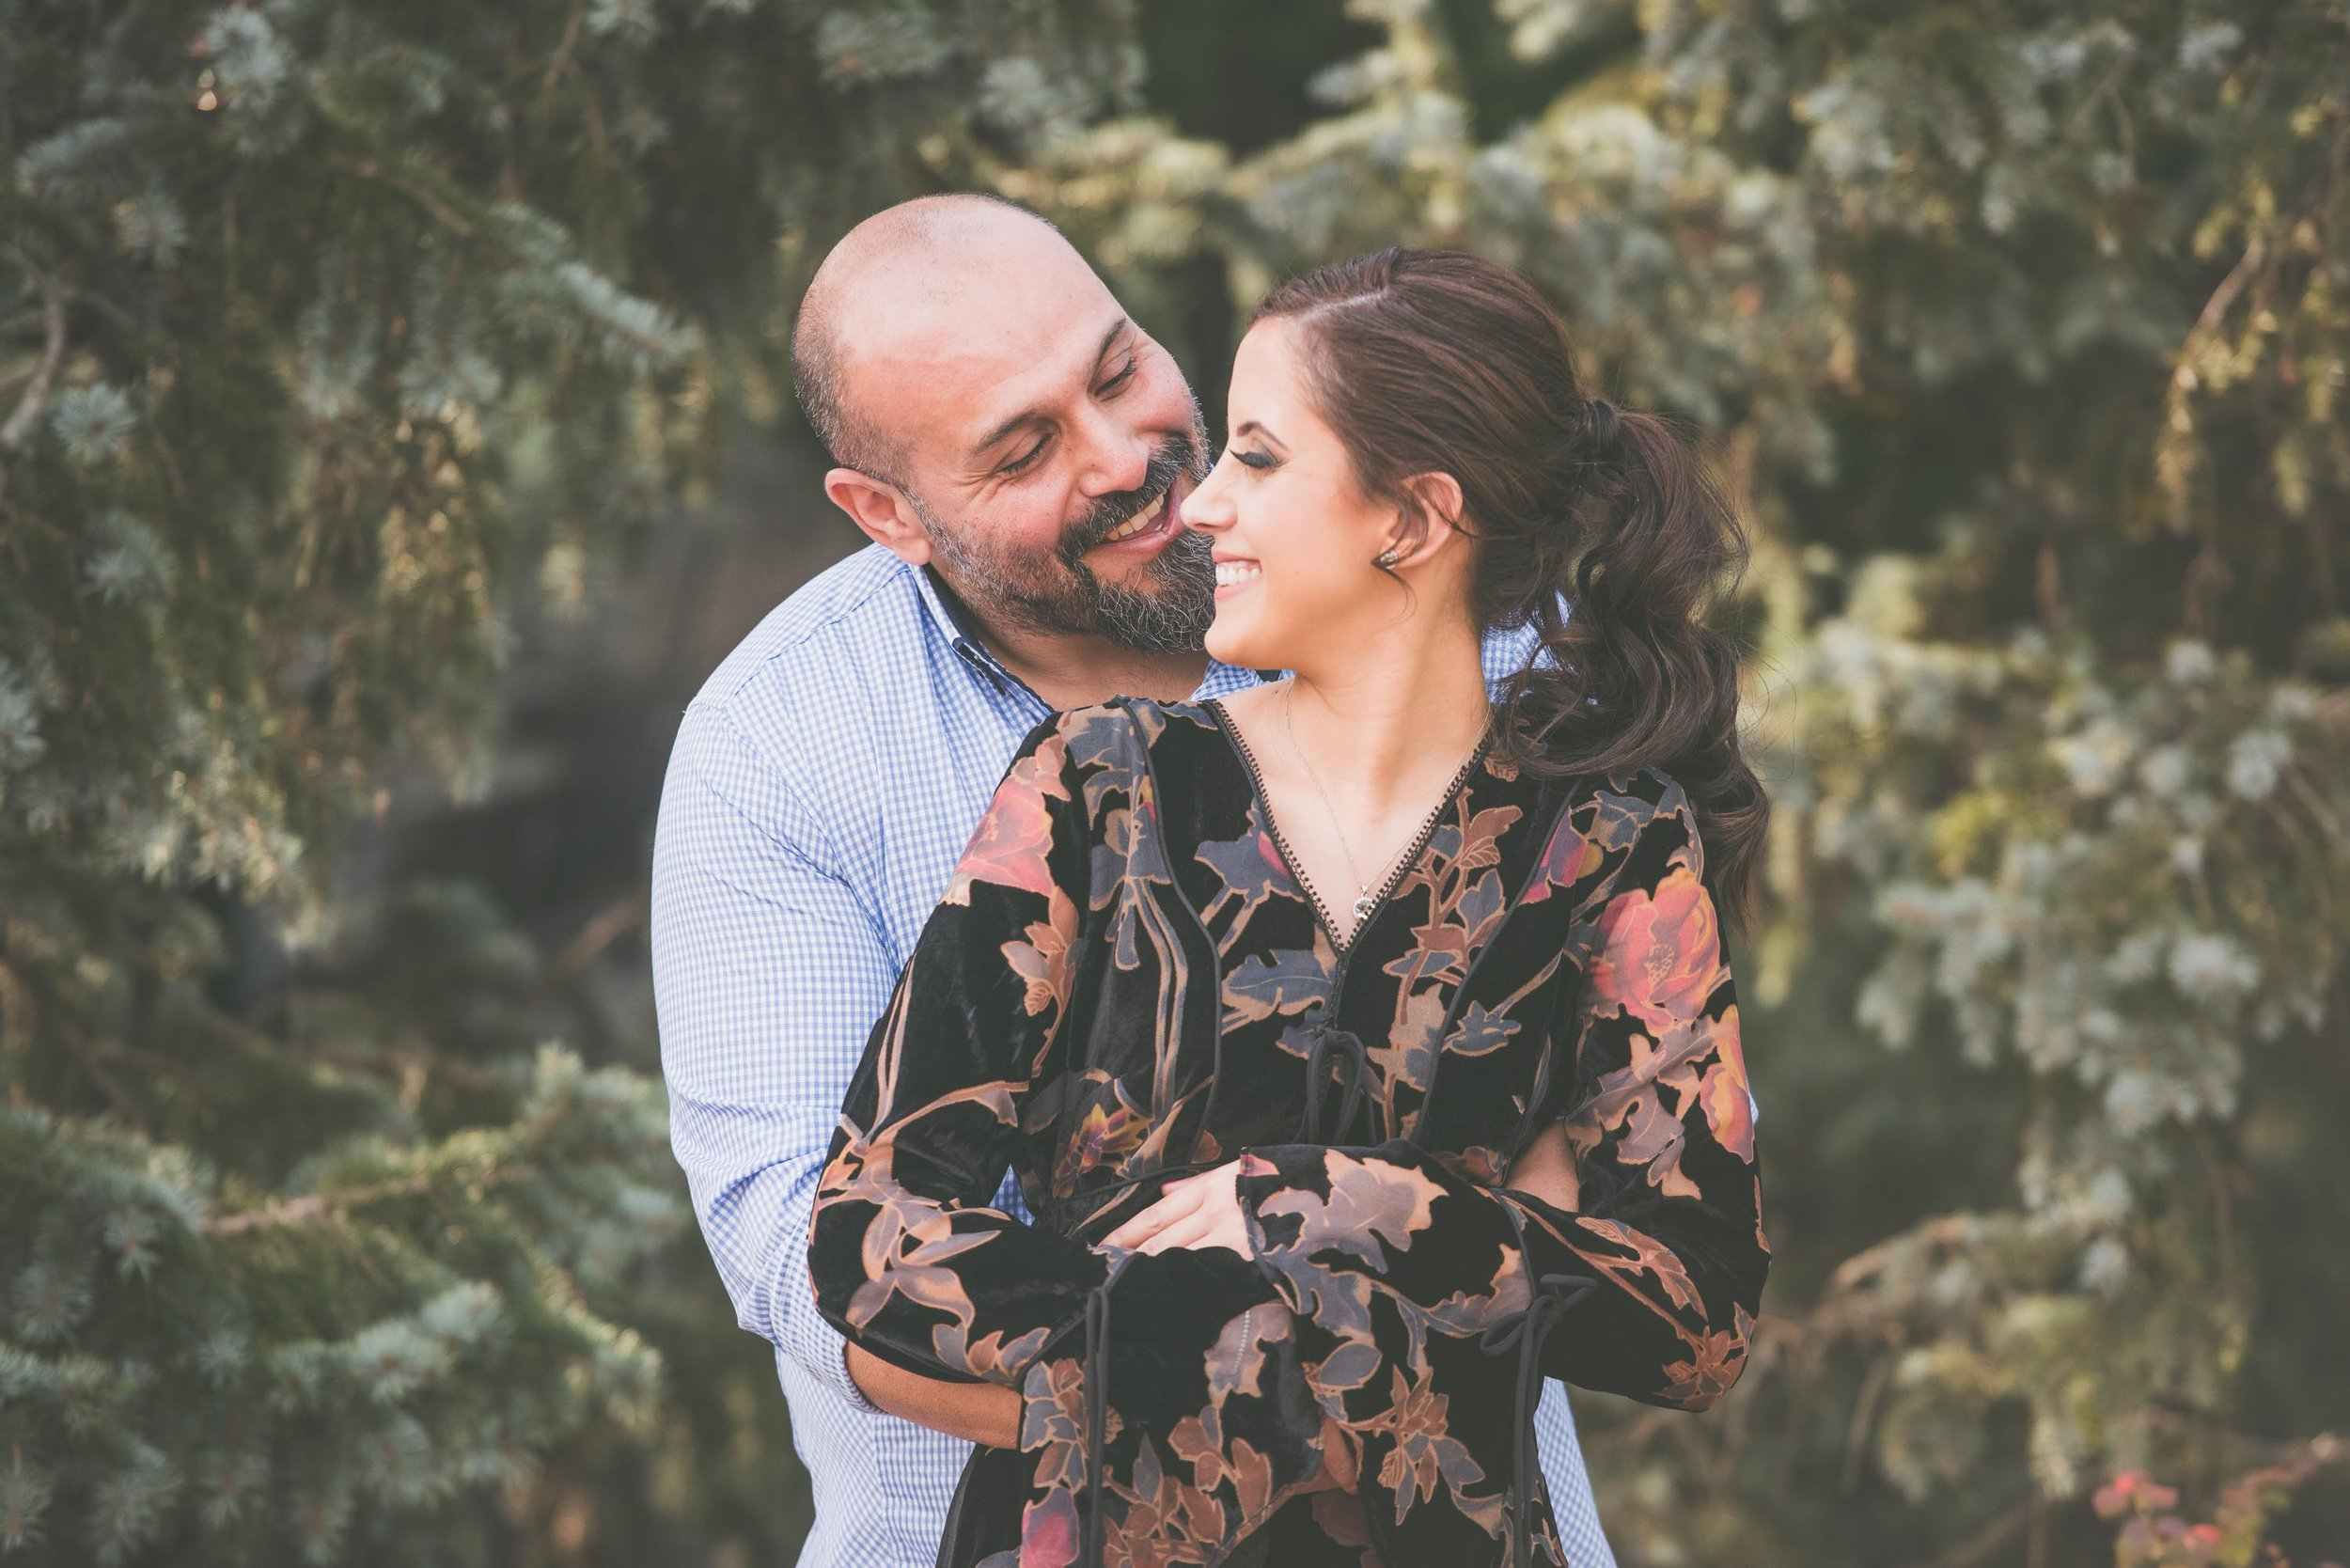 Engagement portrait - Sydney - Photo credit Nicola Bailey.jpg